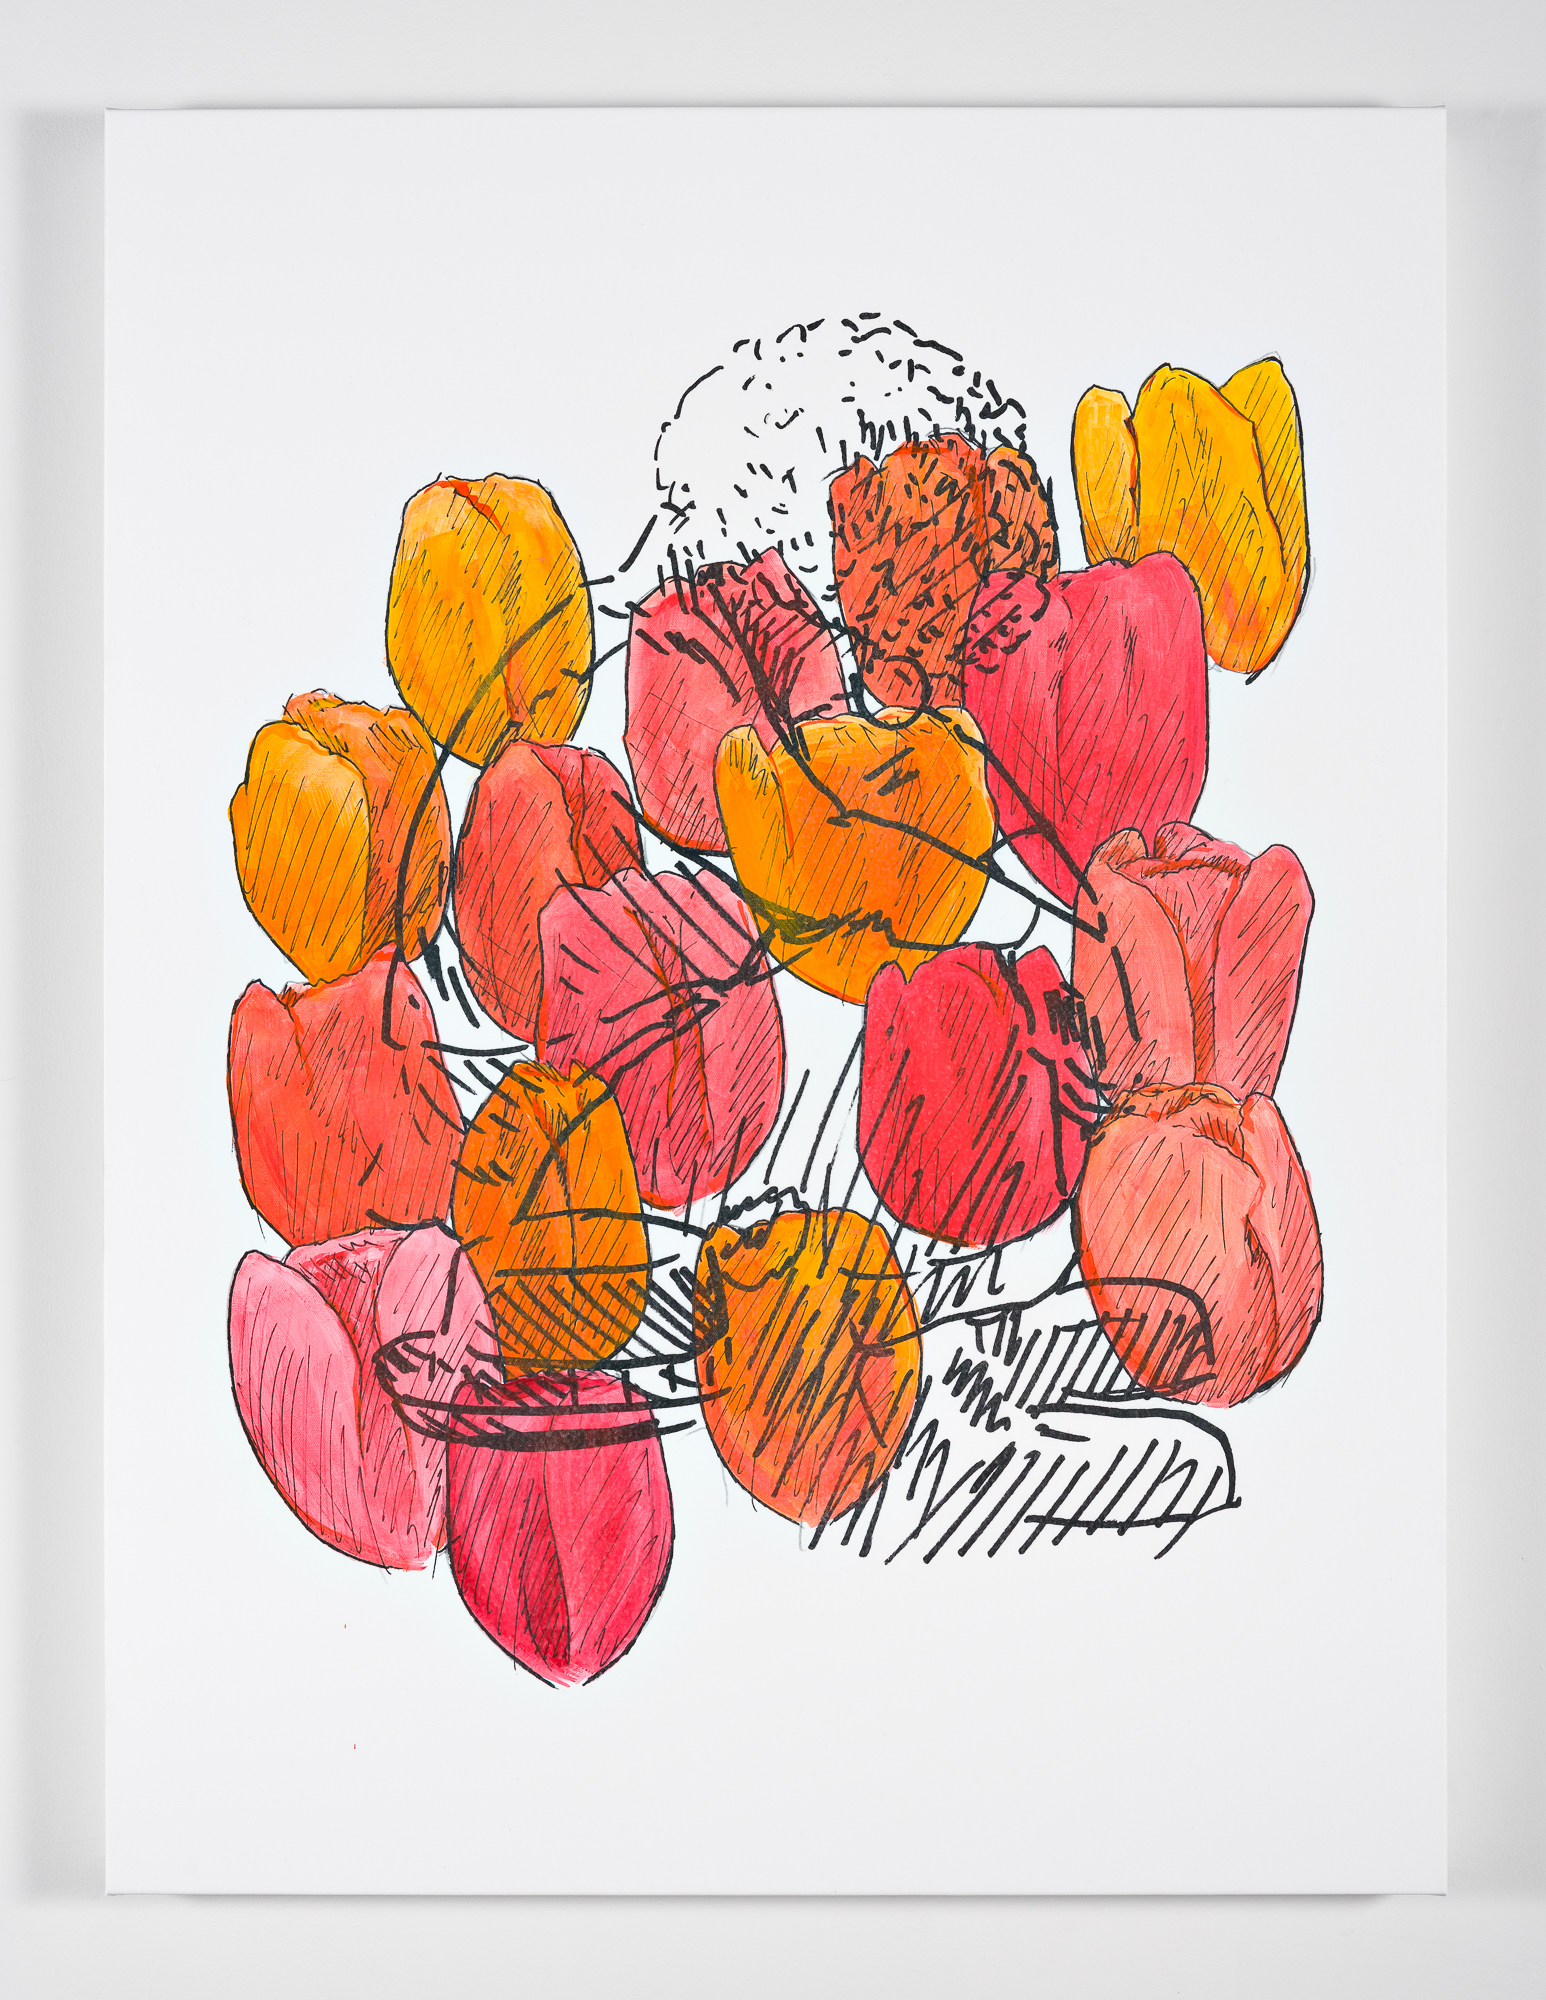 2019_03 - Mieke Marple-03.jpg